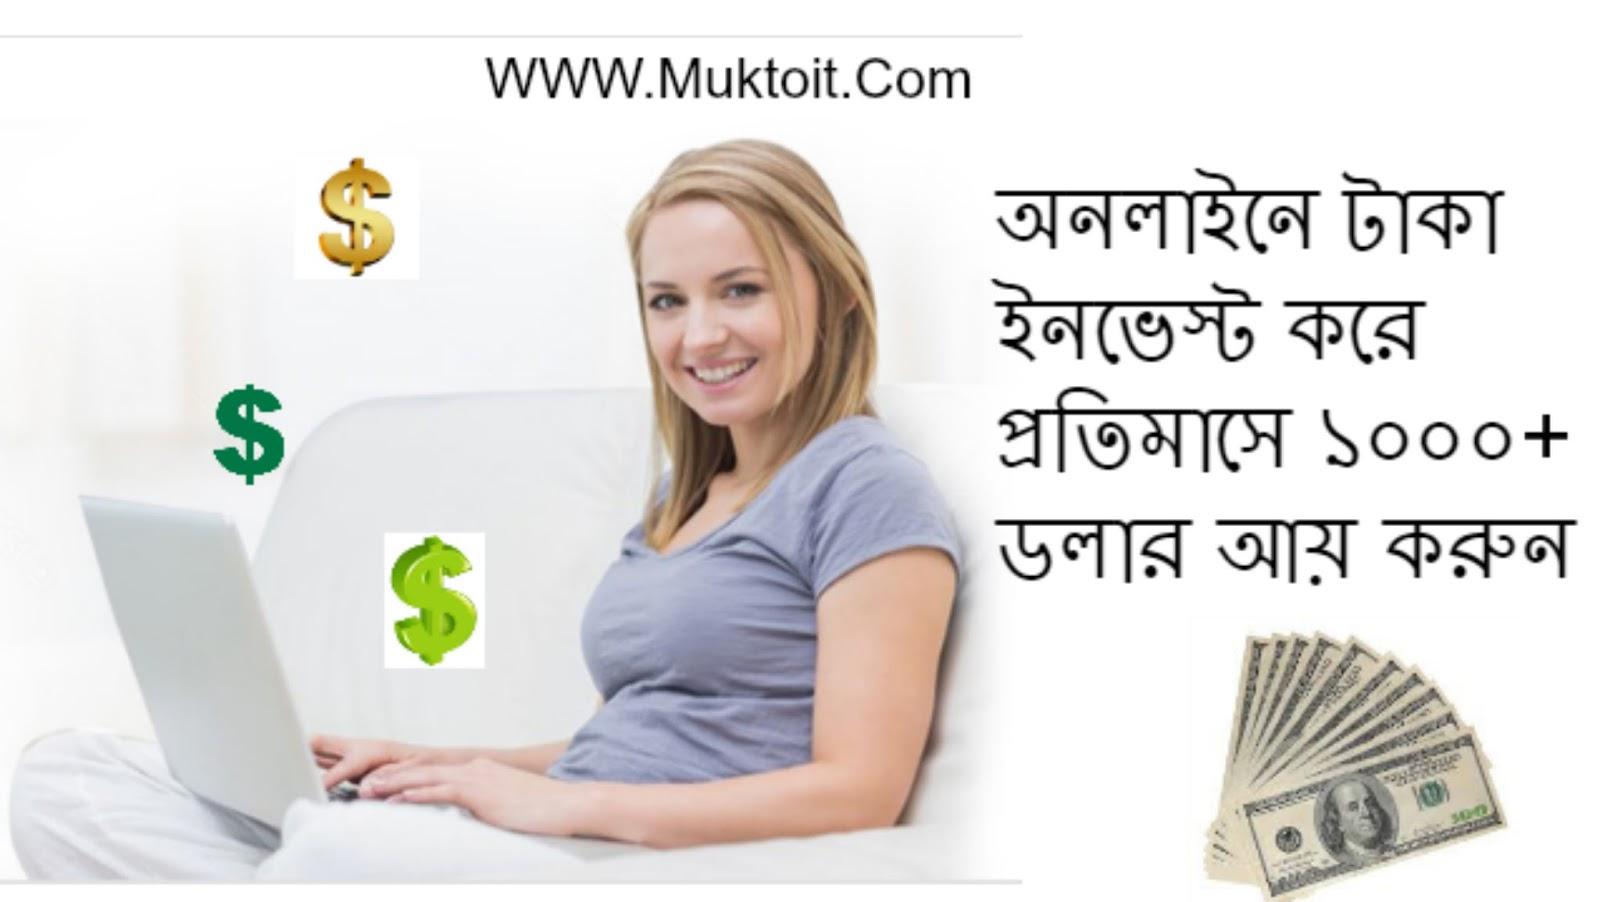 Mypayingads bangla tutorial mypayingads থেকে কিভাবে আয় করা যায়